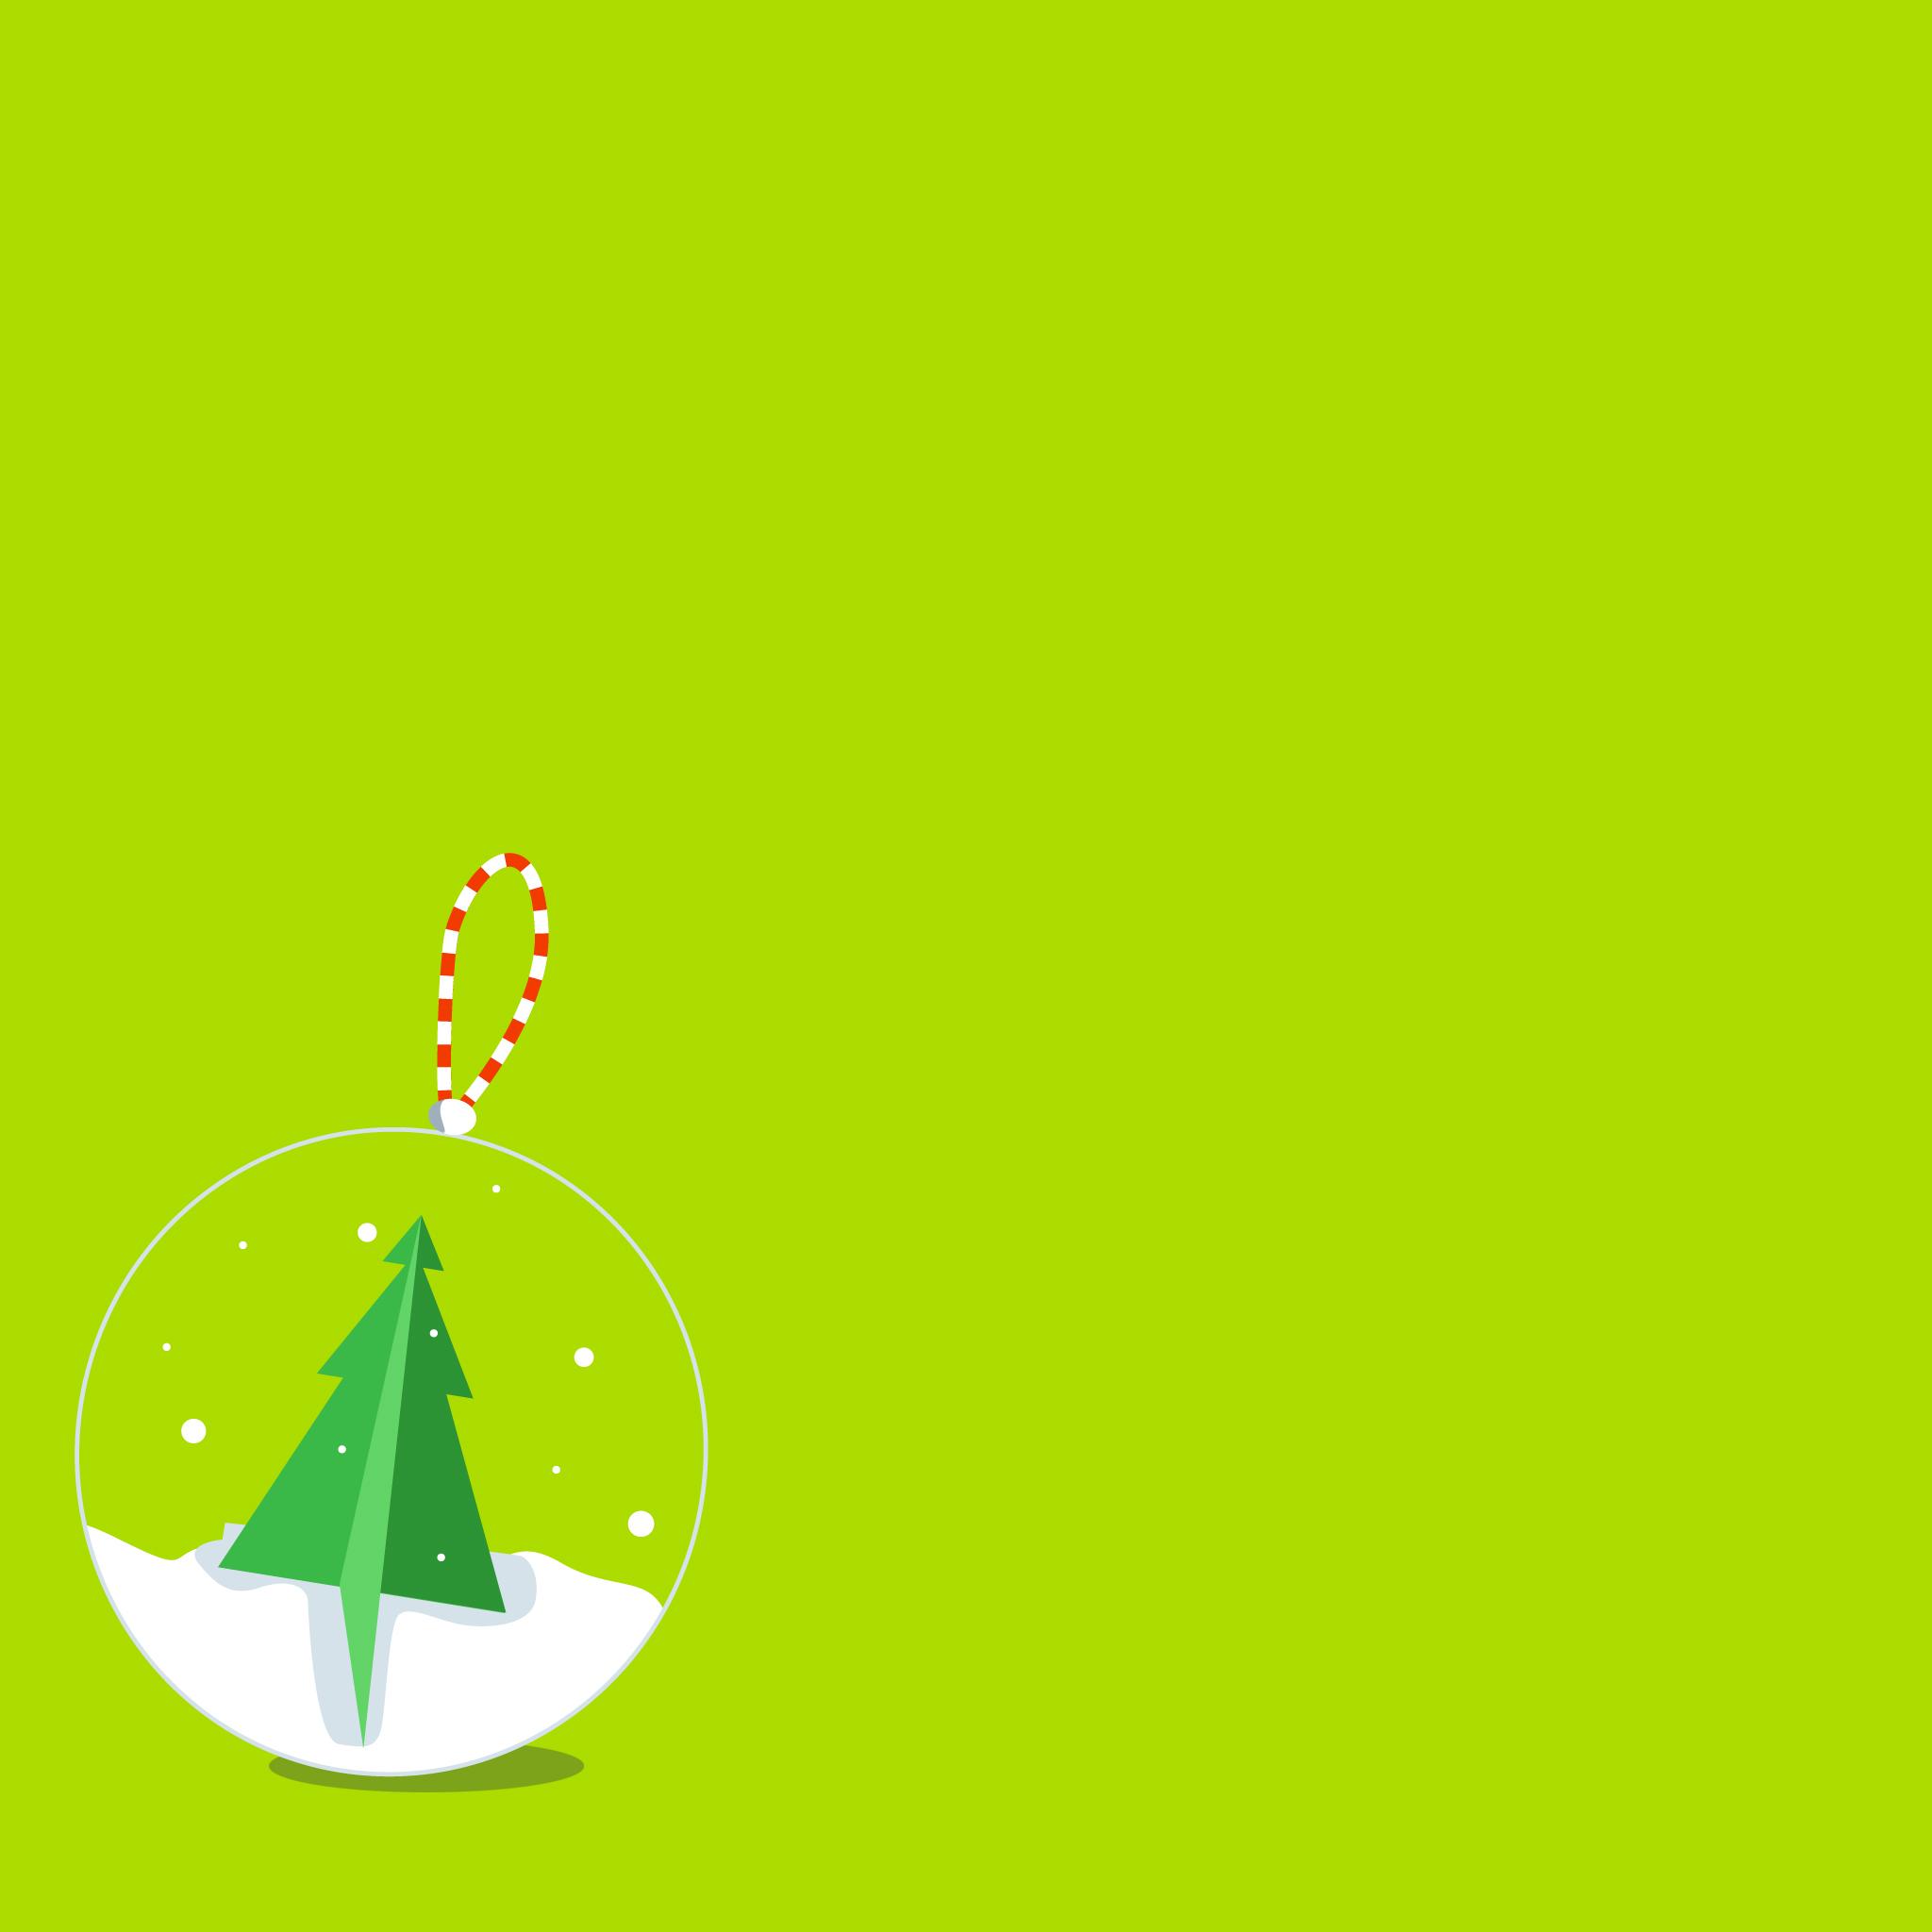 Christmas-Ornament-3Wallpapers-iPad-Retina